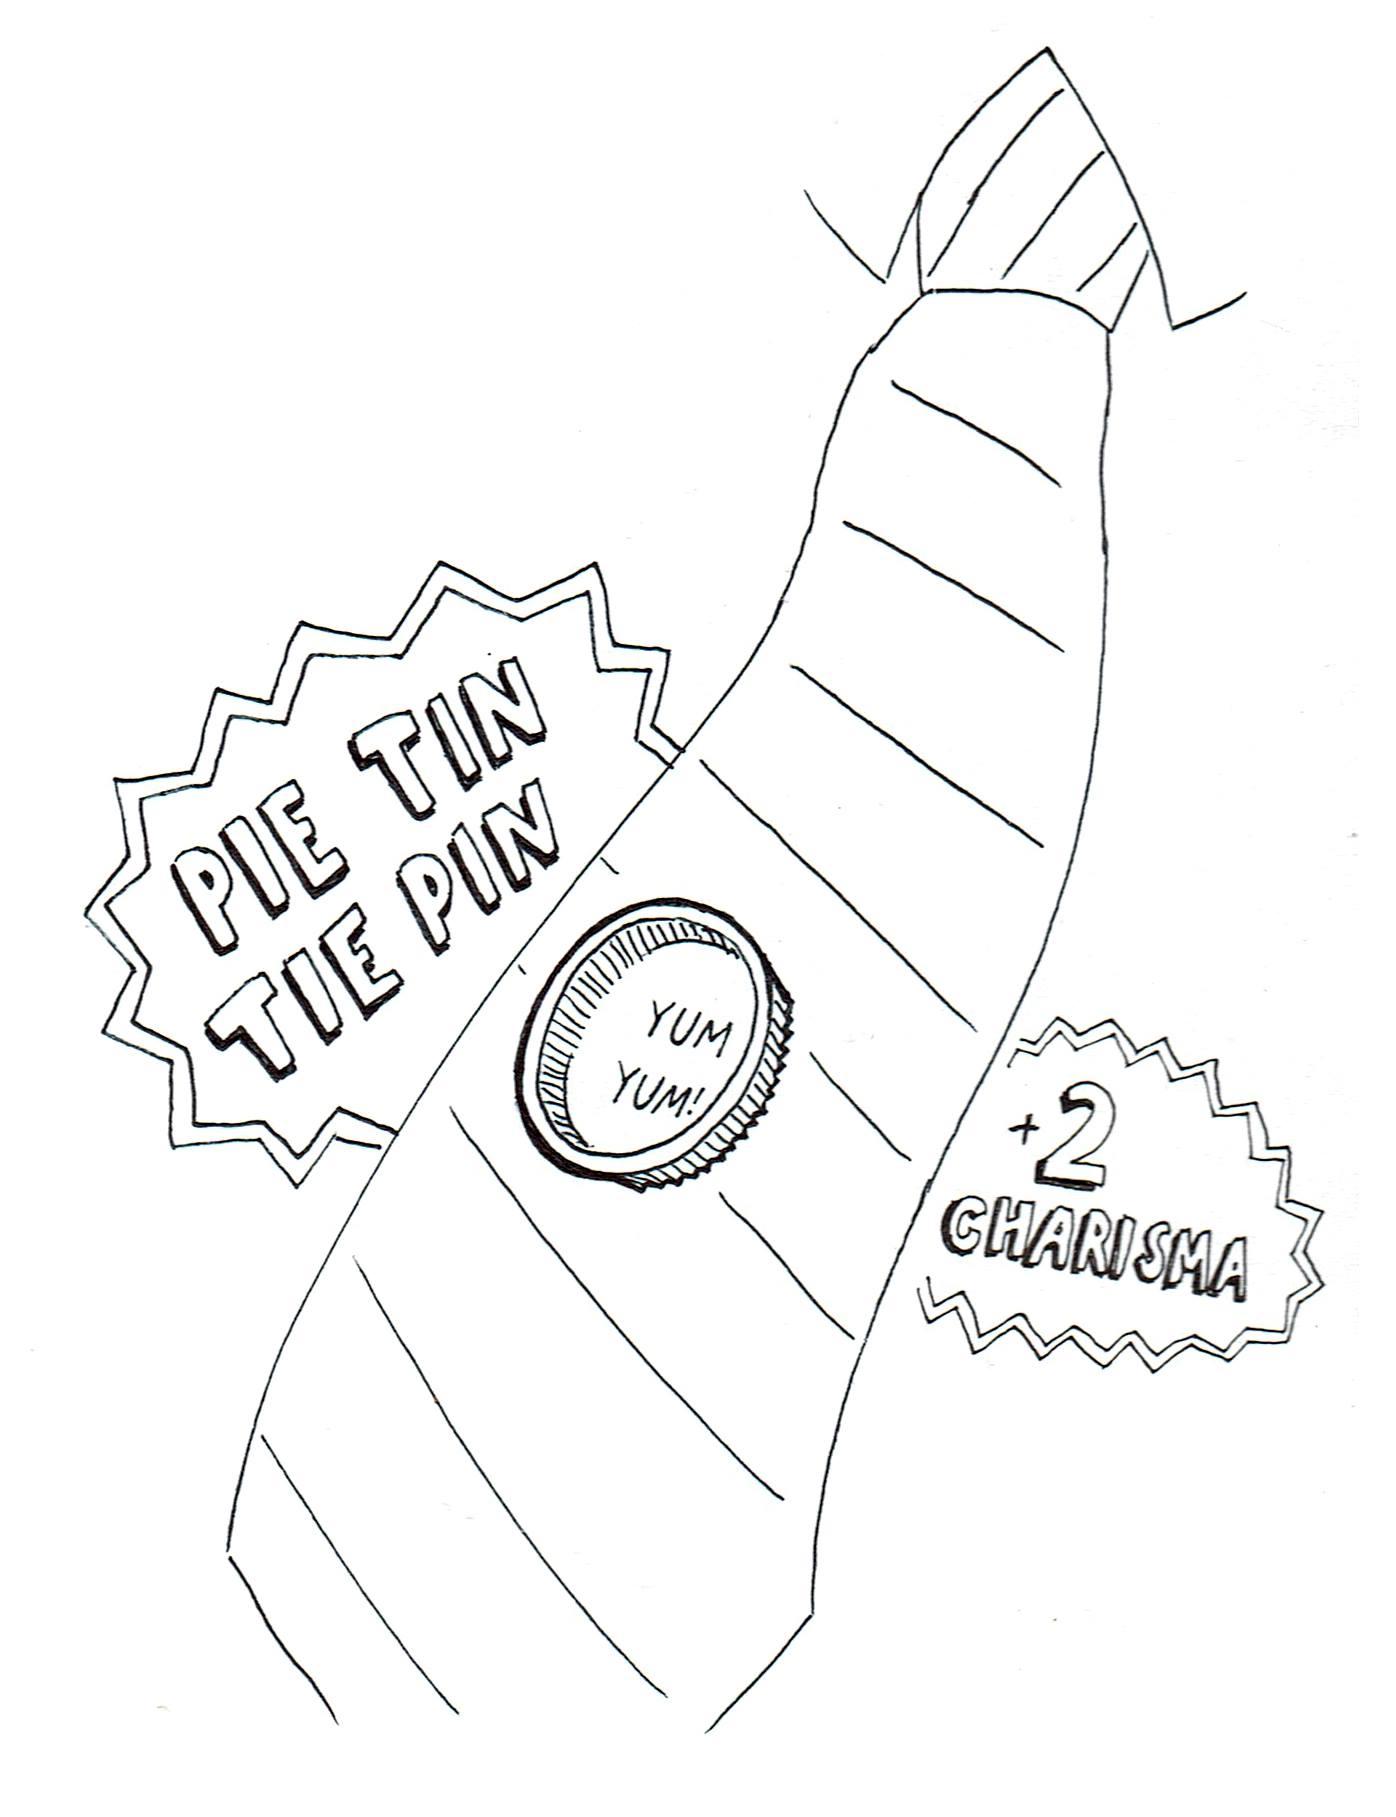 Pie Tin Tie Pin: +2 Charisma!